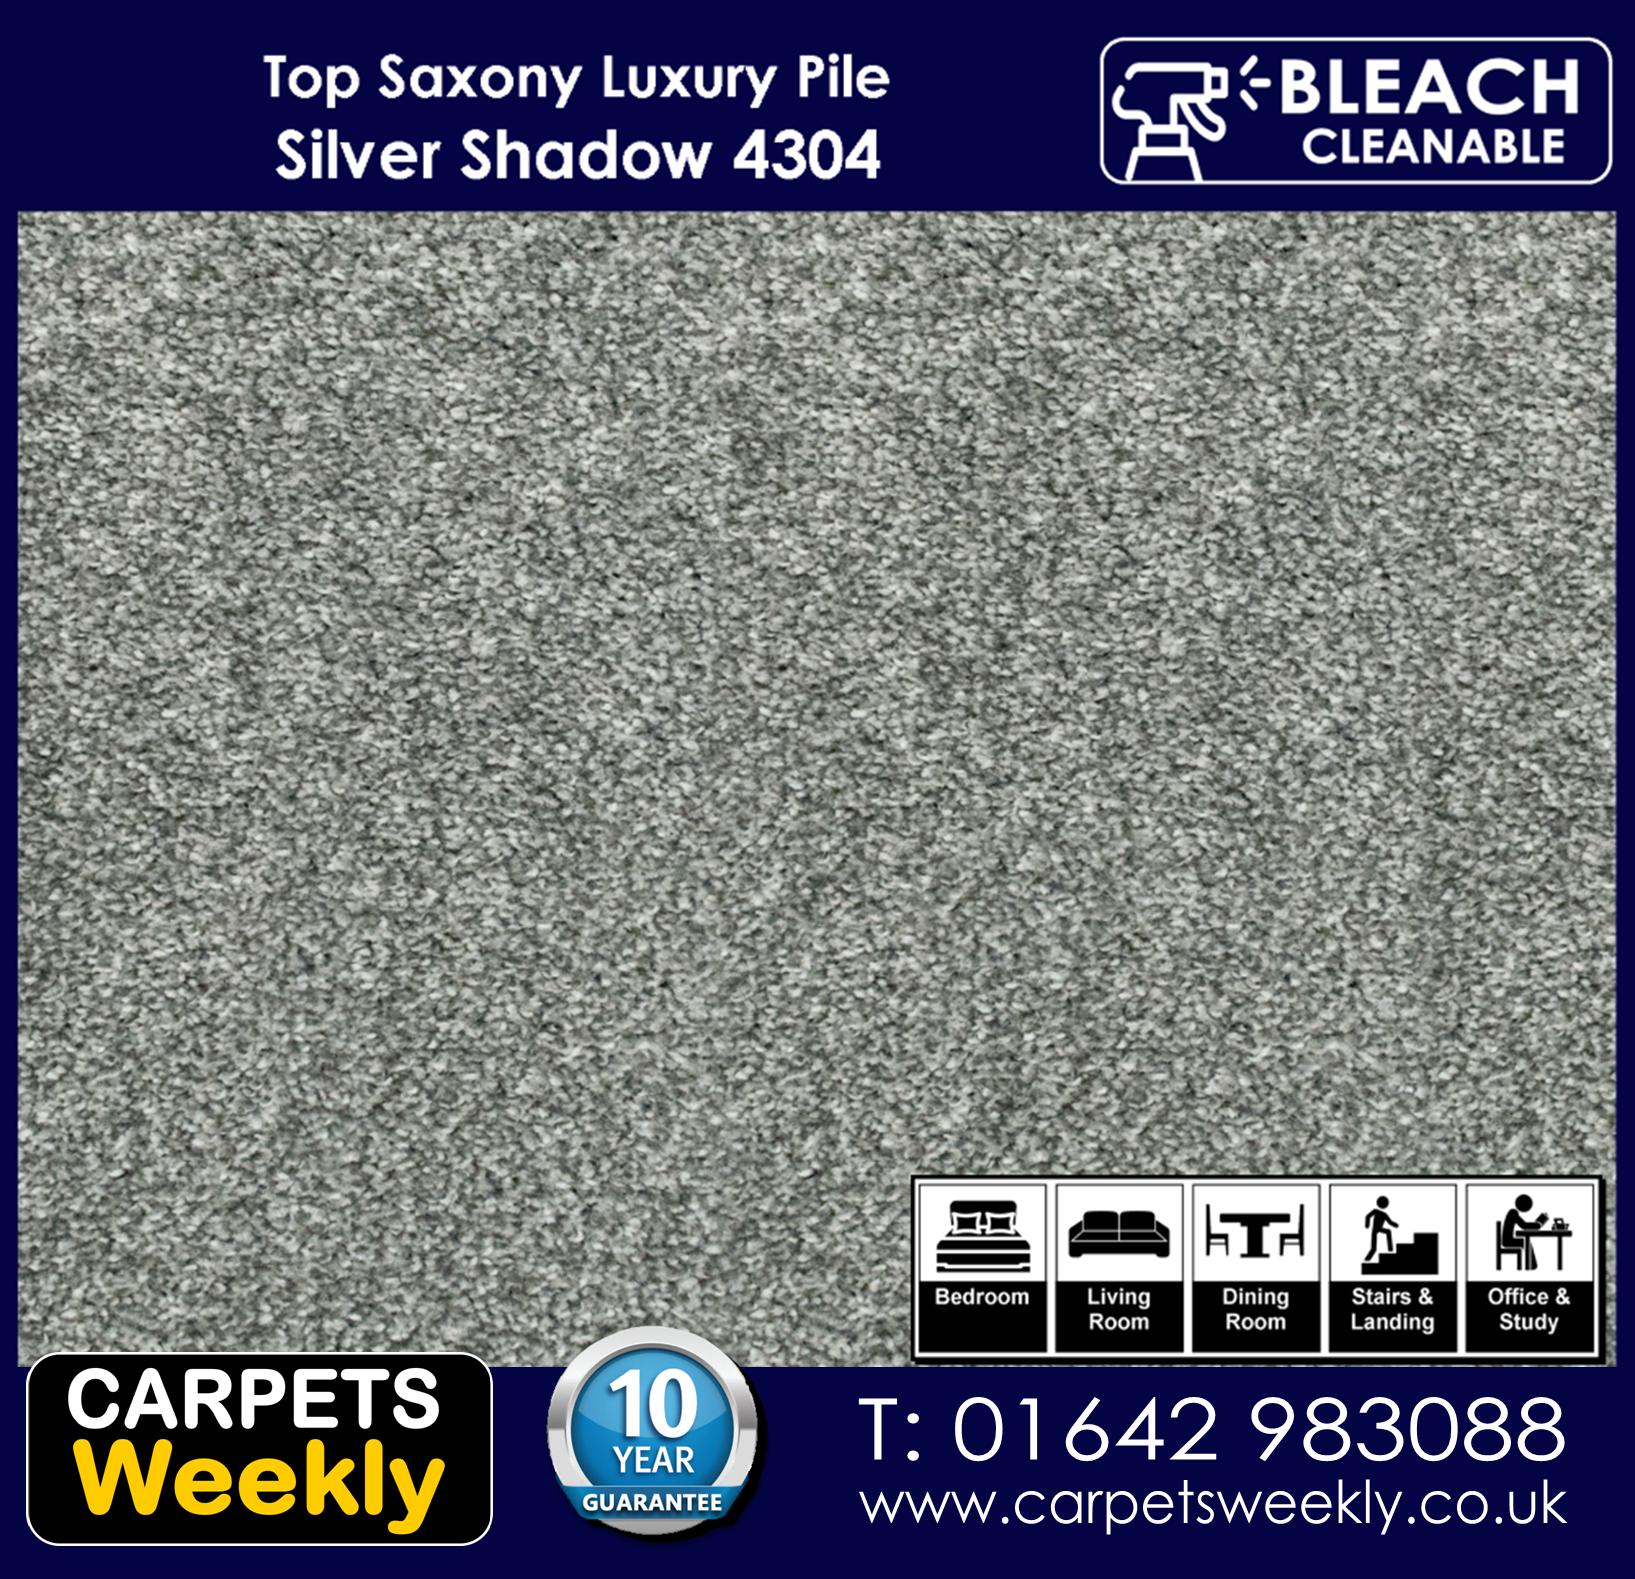 Top Saxony Silver Shadow - 4304 Carpet. Carpets Weekly